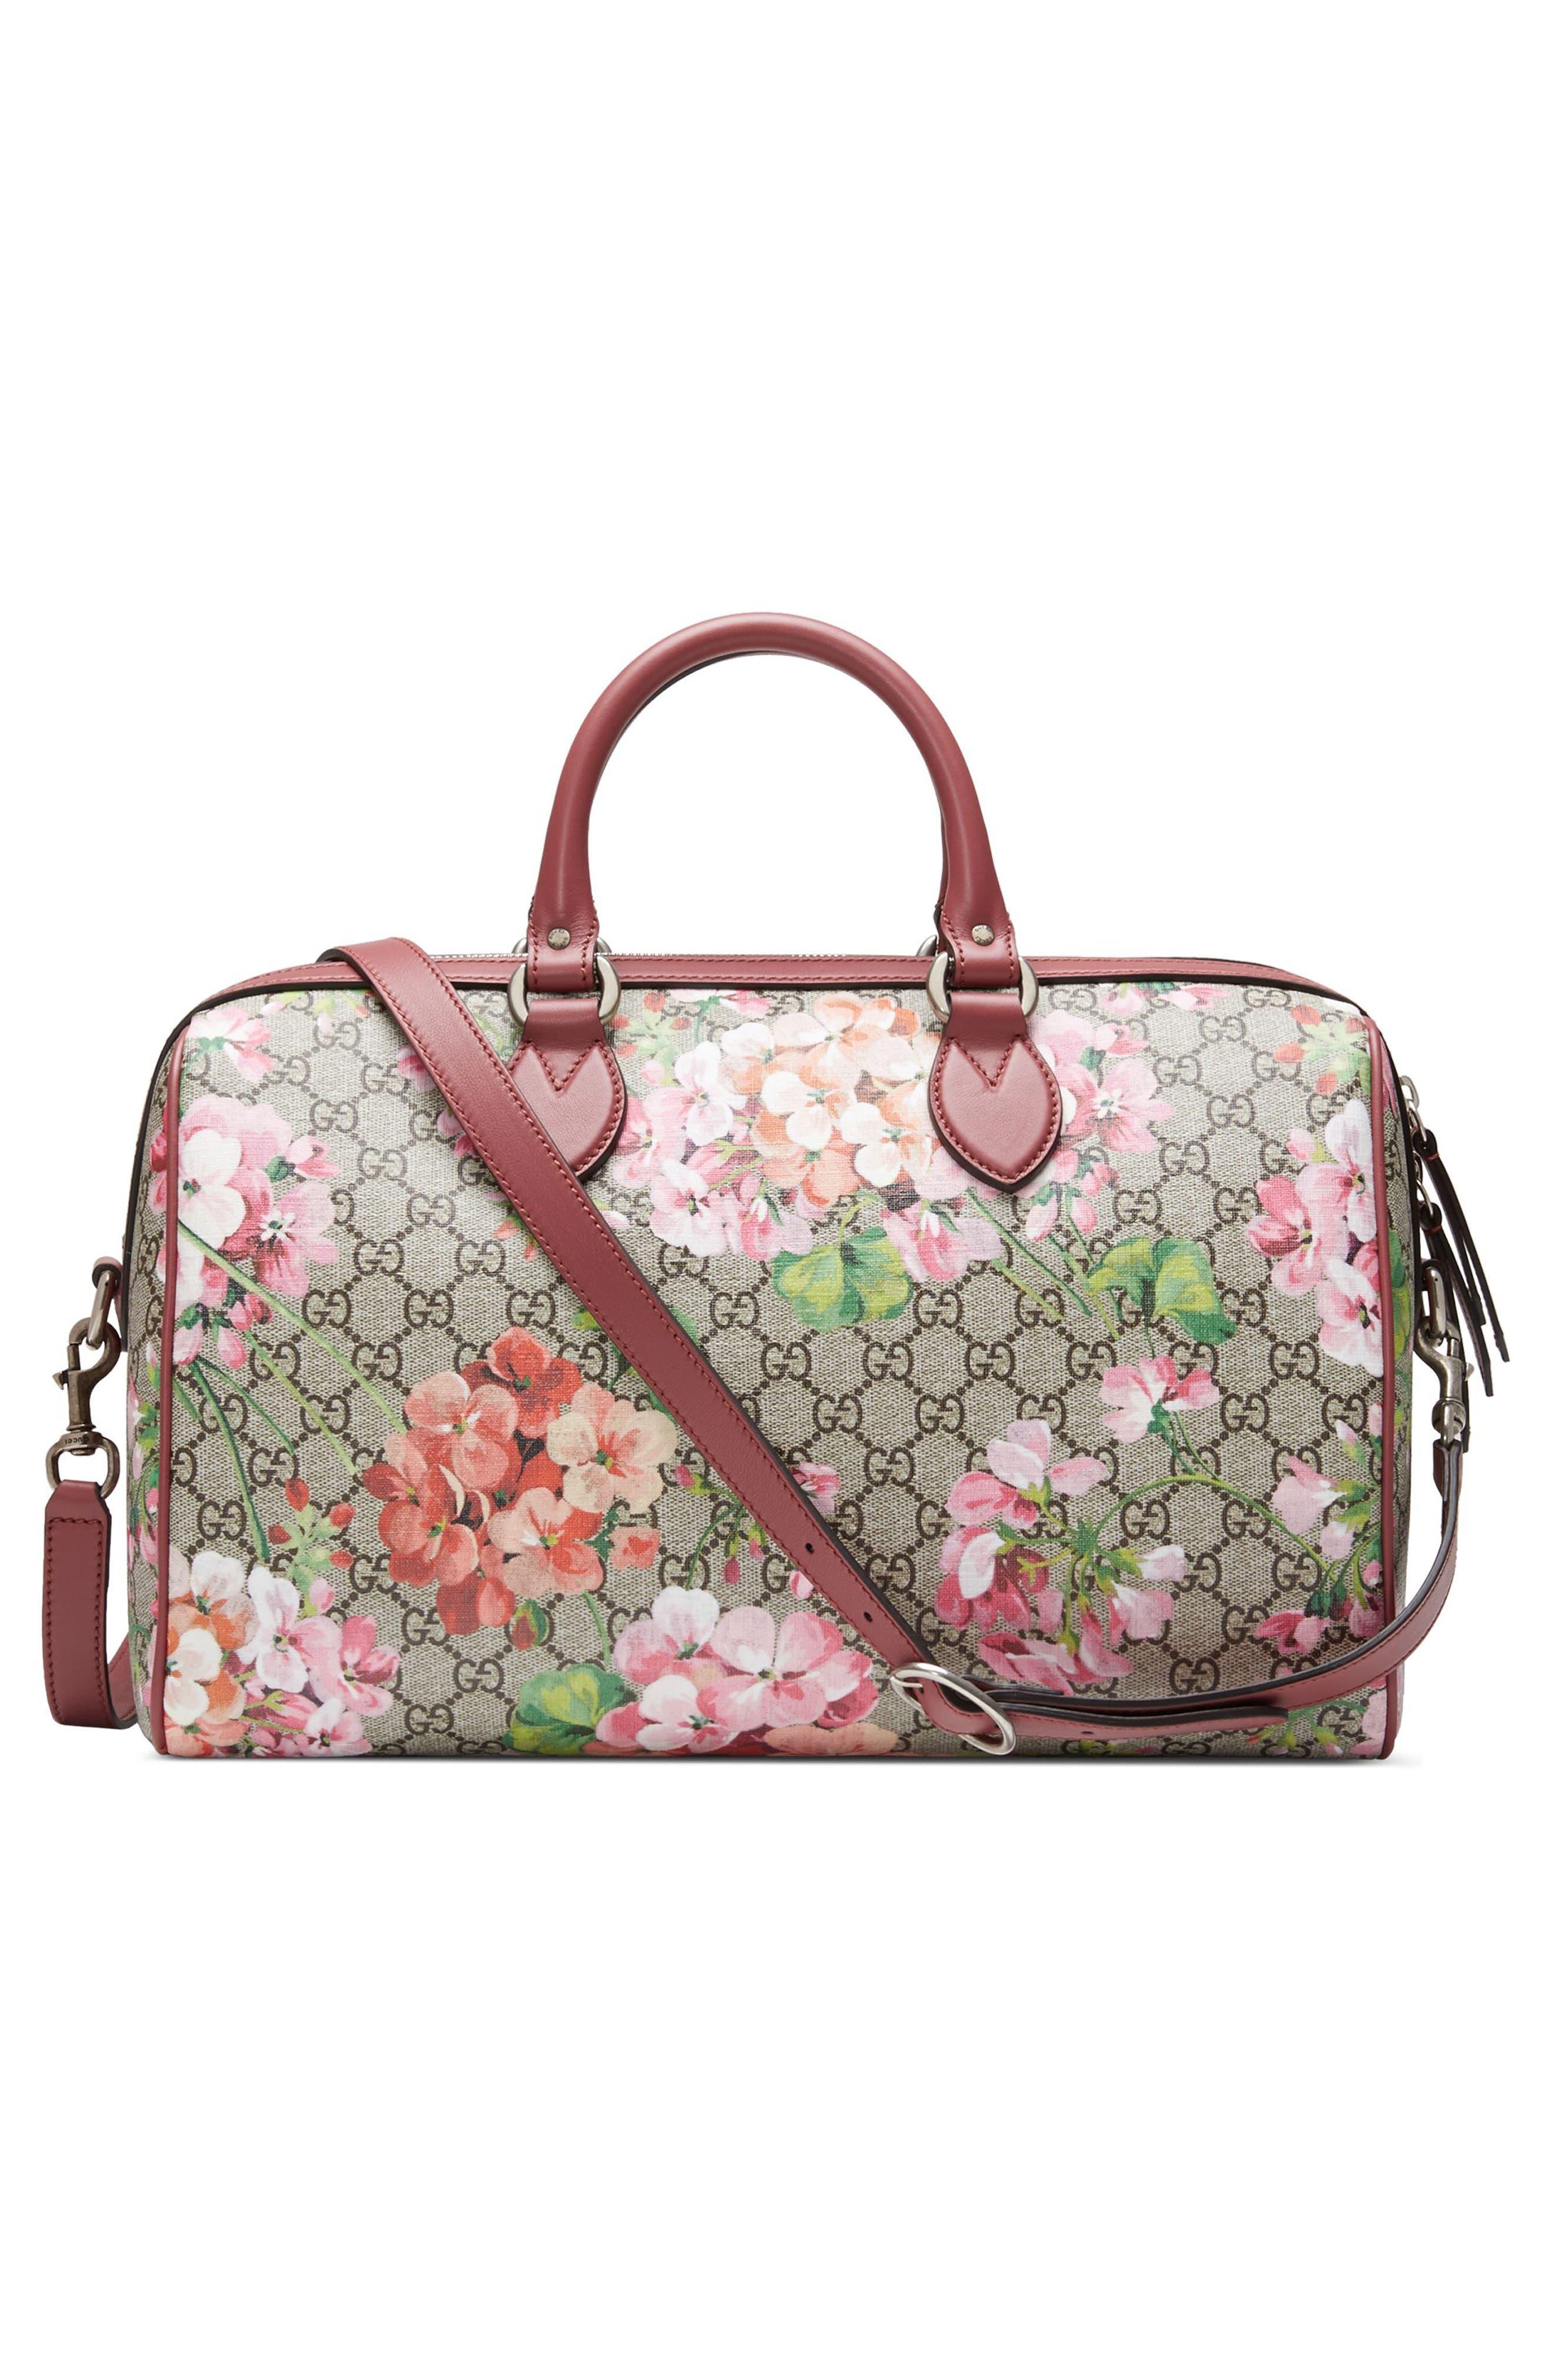 Medium Blooms GG Supreme Top Handle Canvas Bag,                             Alternate thumbnail 2, color,                             250